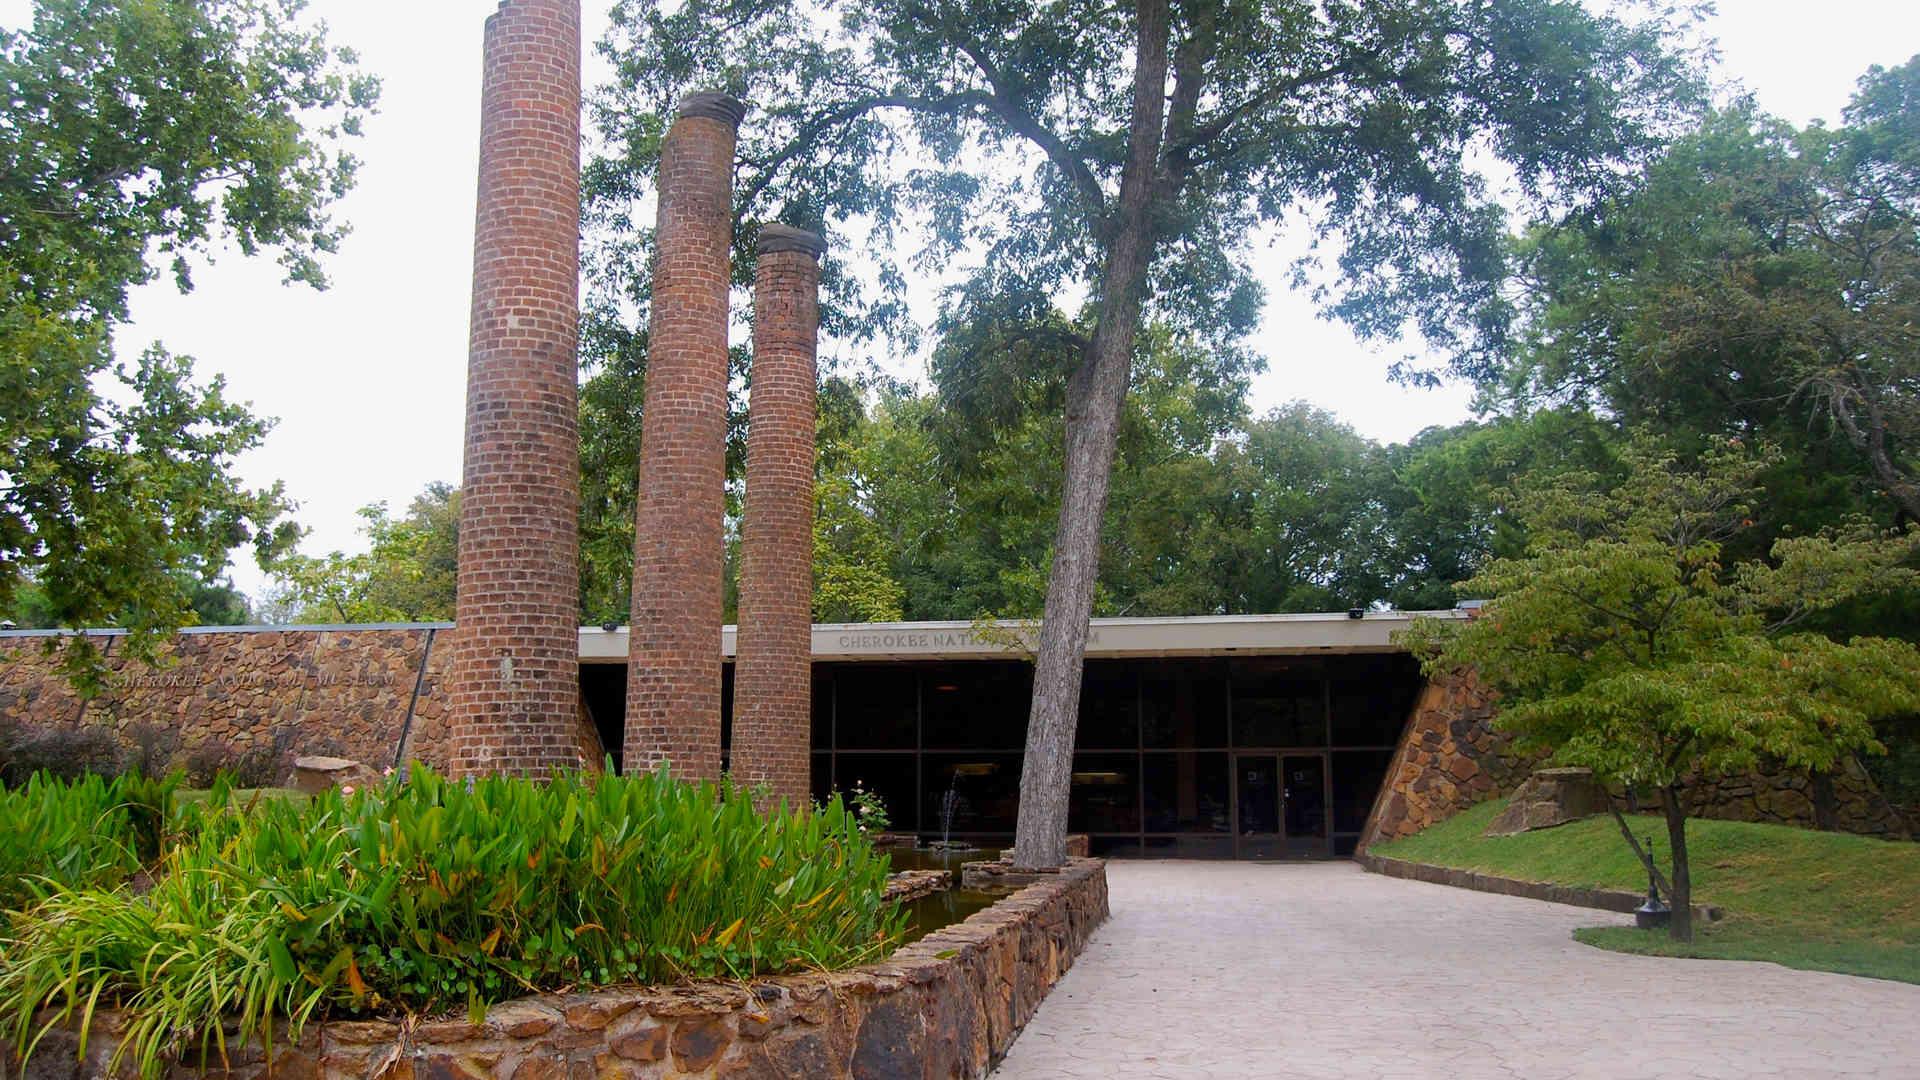 trail of tears museum enteryway